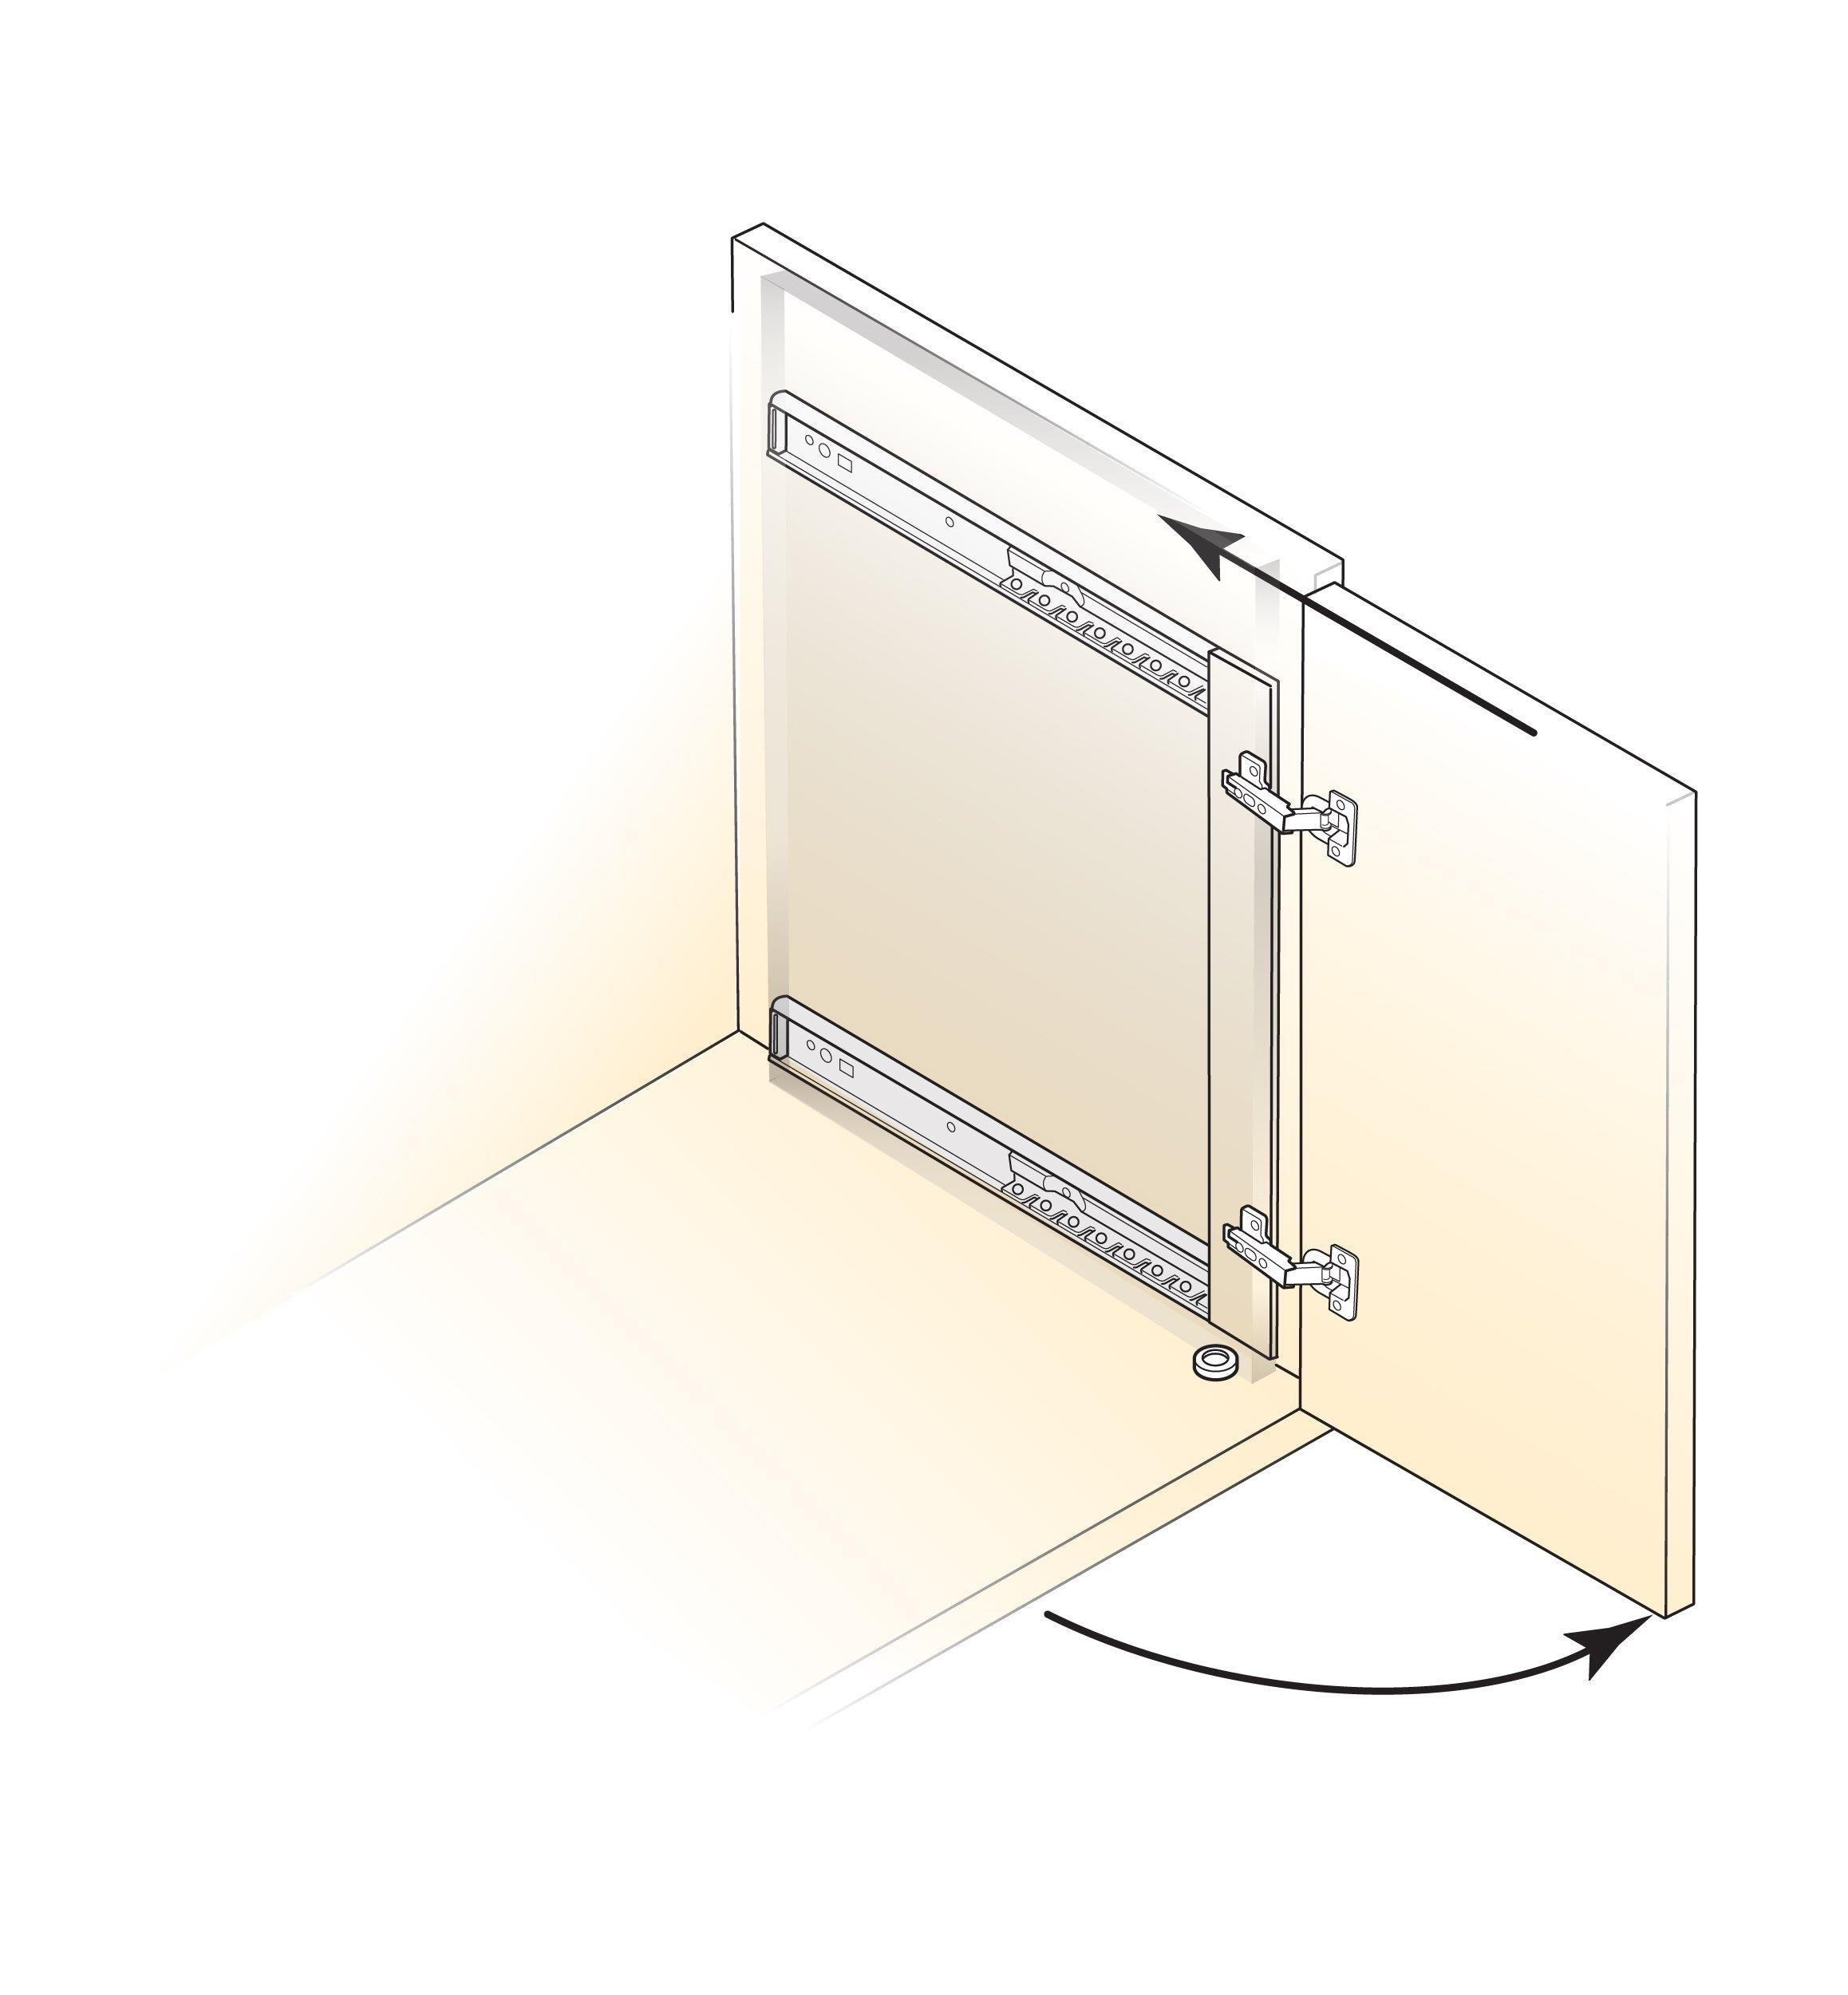 Concealed Door Slides In 2020 Overlay Hinges Diy Cabinet Doors Concealed